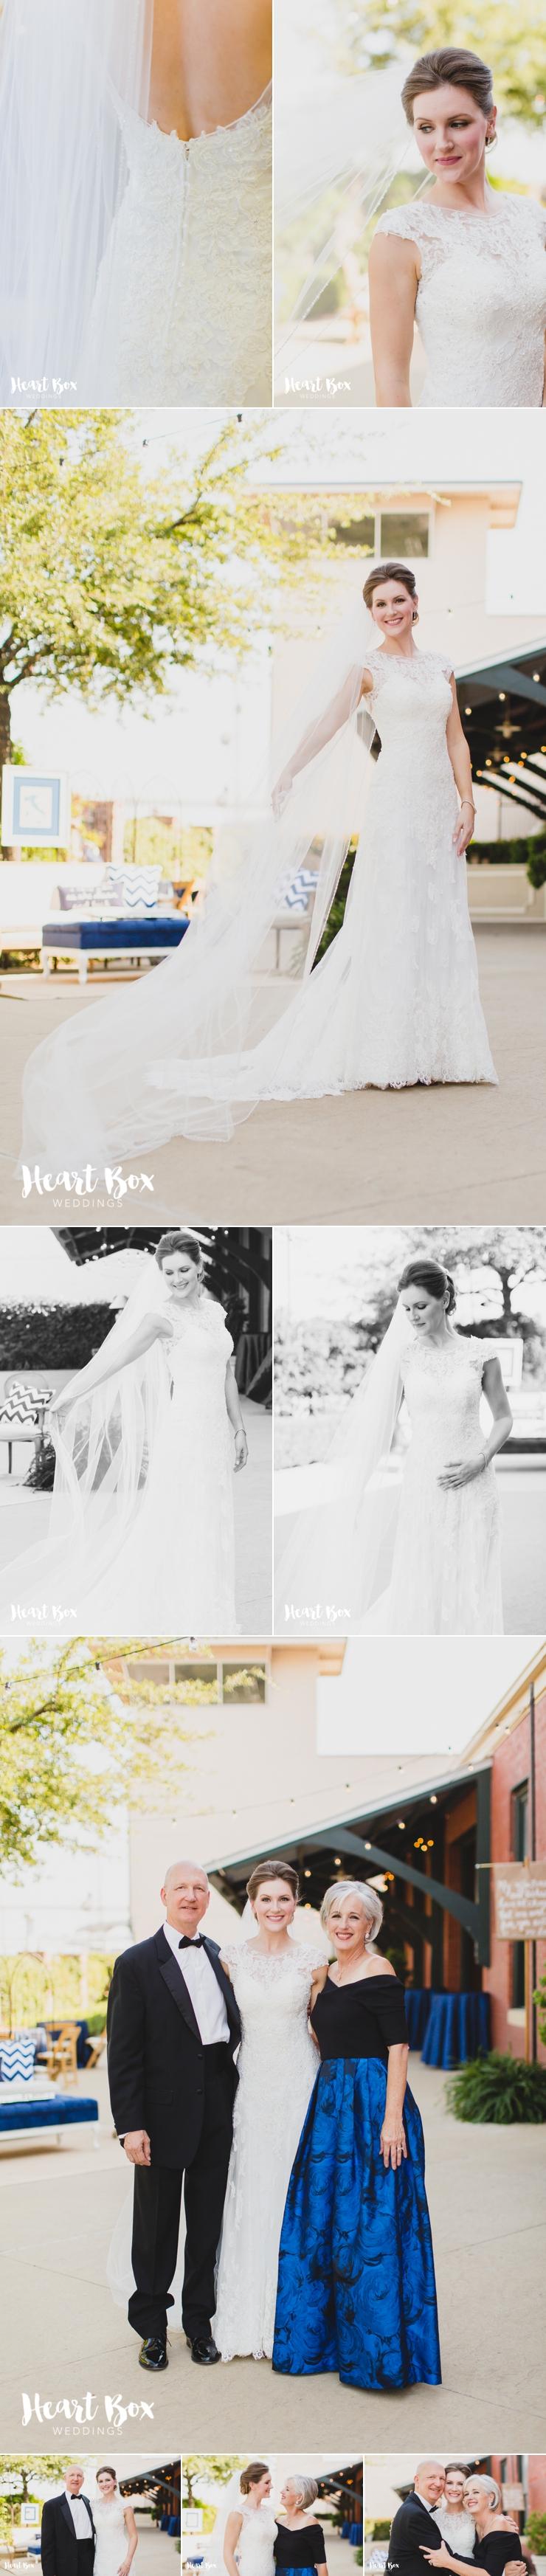 Anthony Wedding Blog Collages 7.jpg